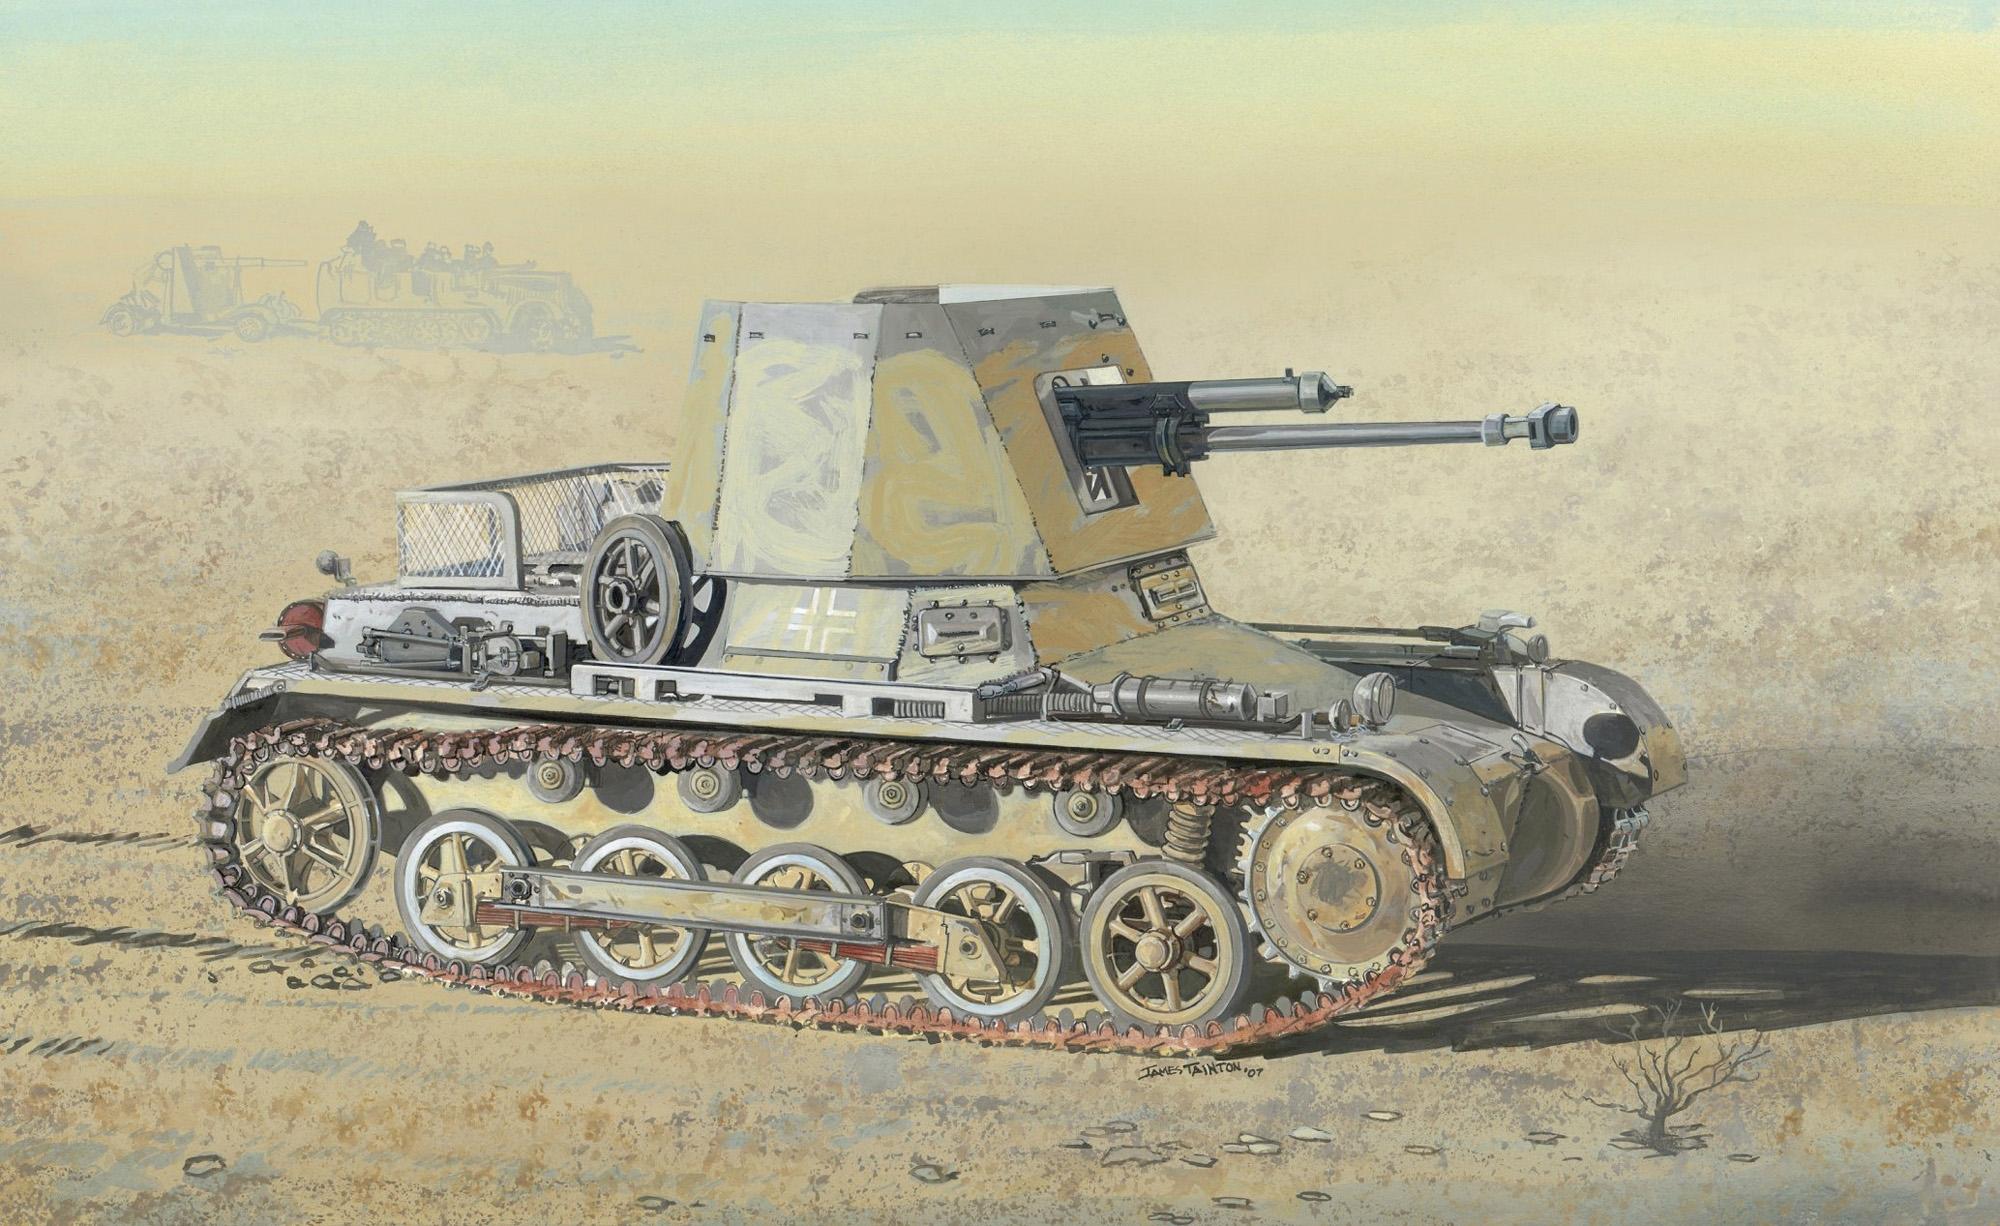 рисунок Panzerjager I 4,7cm PaK (t)